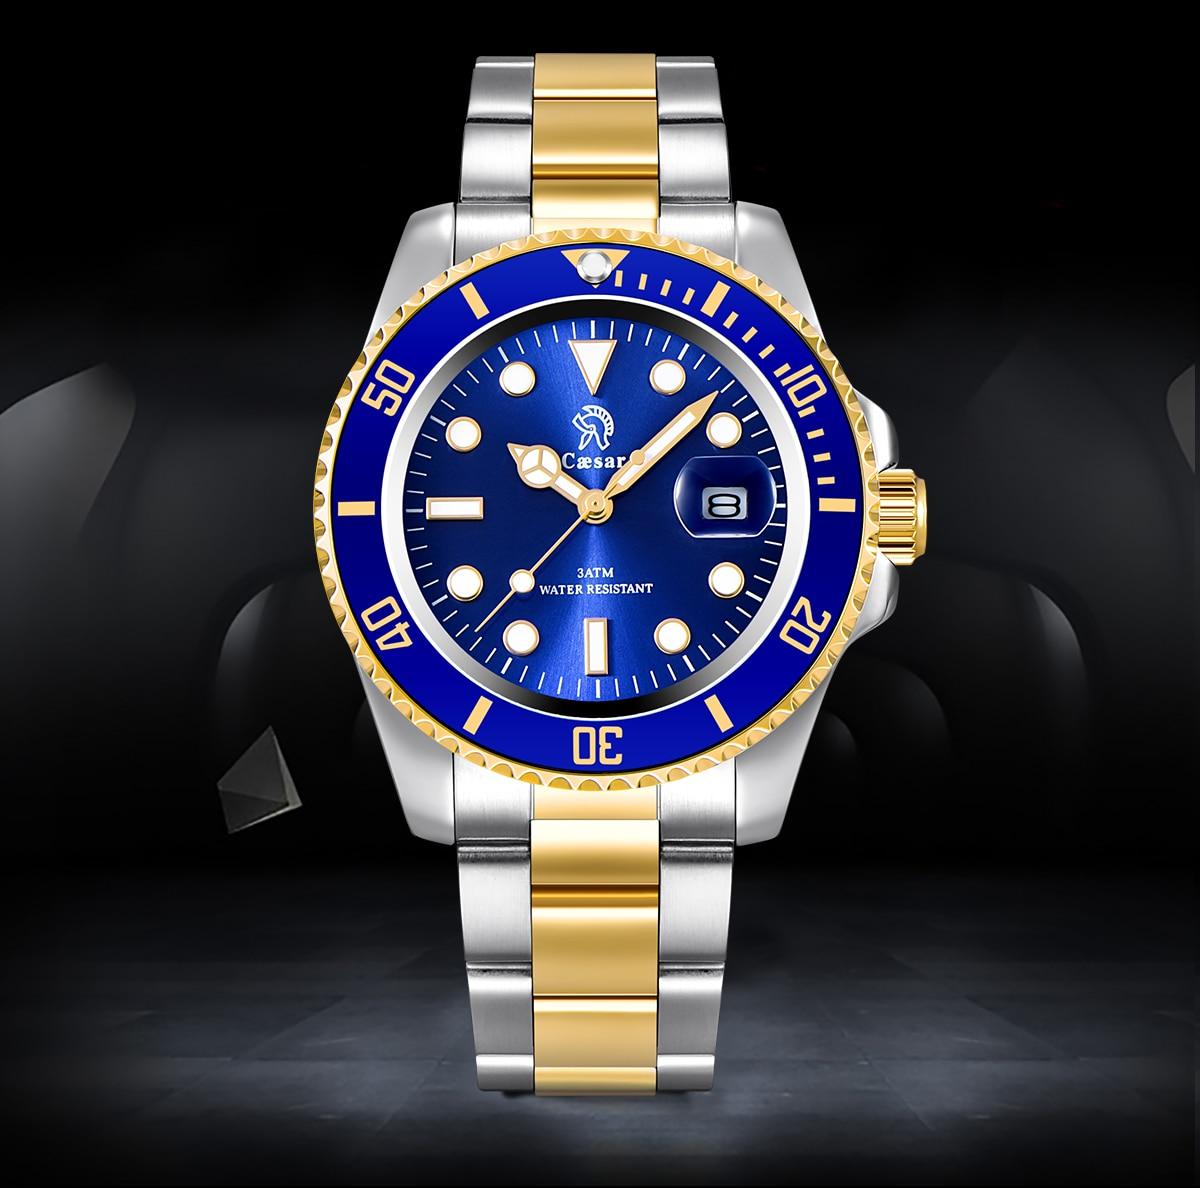 Ha6ffbb3e56ab4c98ad3e5c52d902be43j Rose Gold caesar  Top Brand Luxury Watches